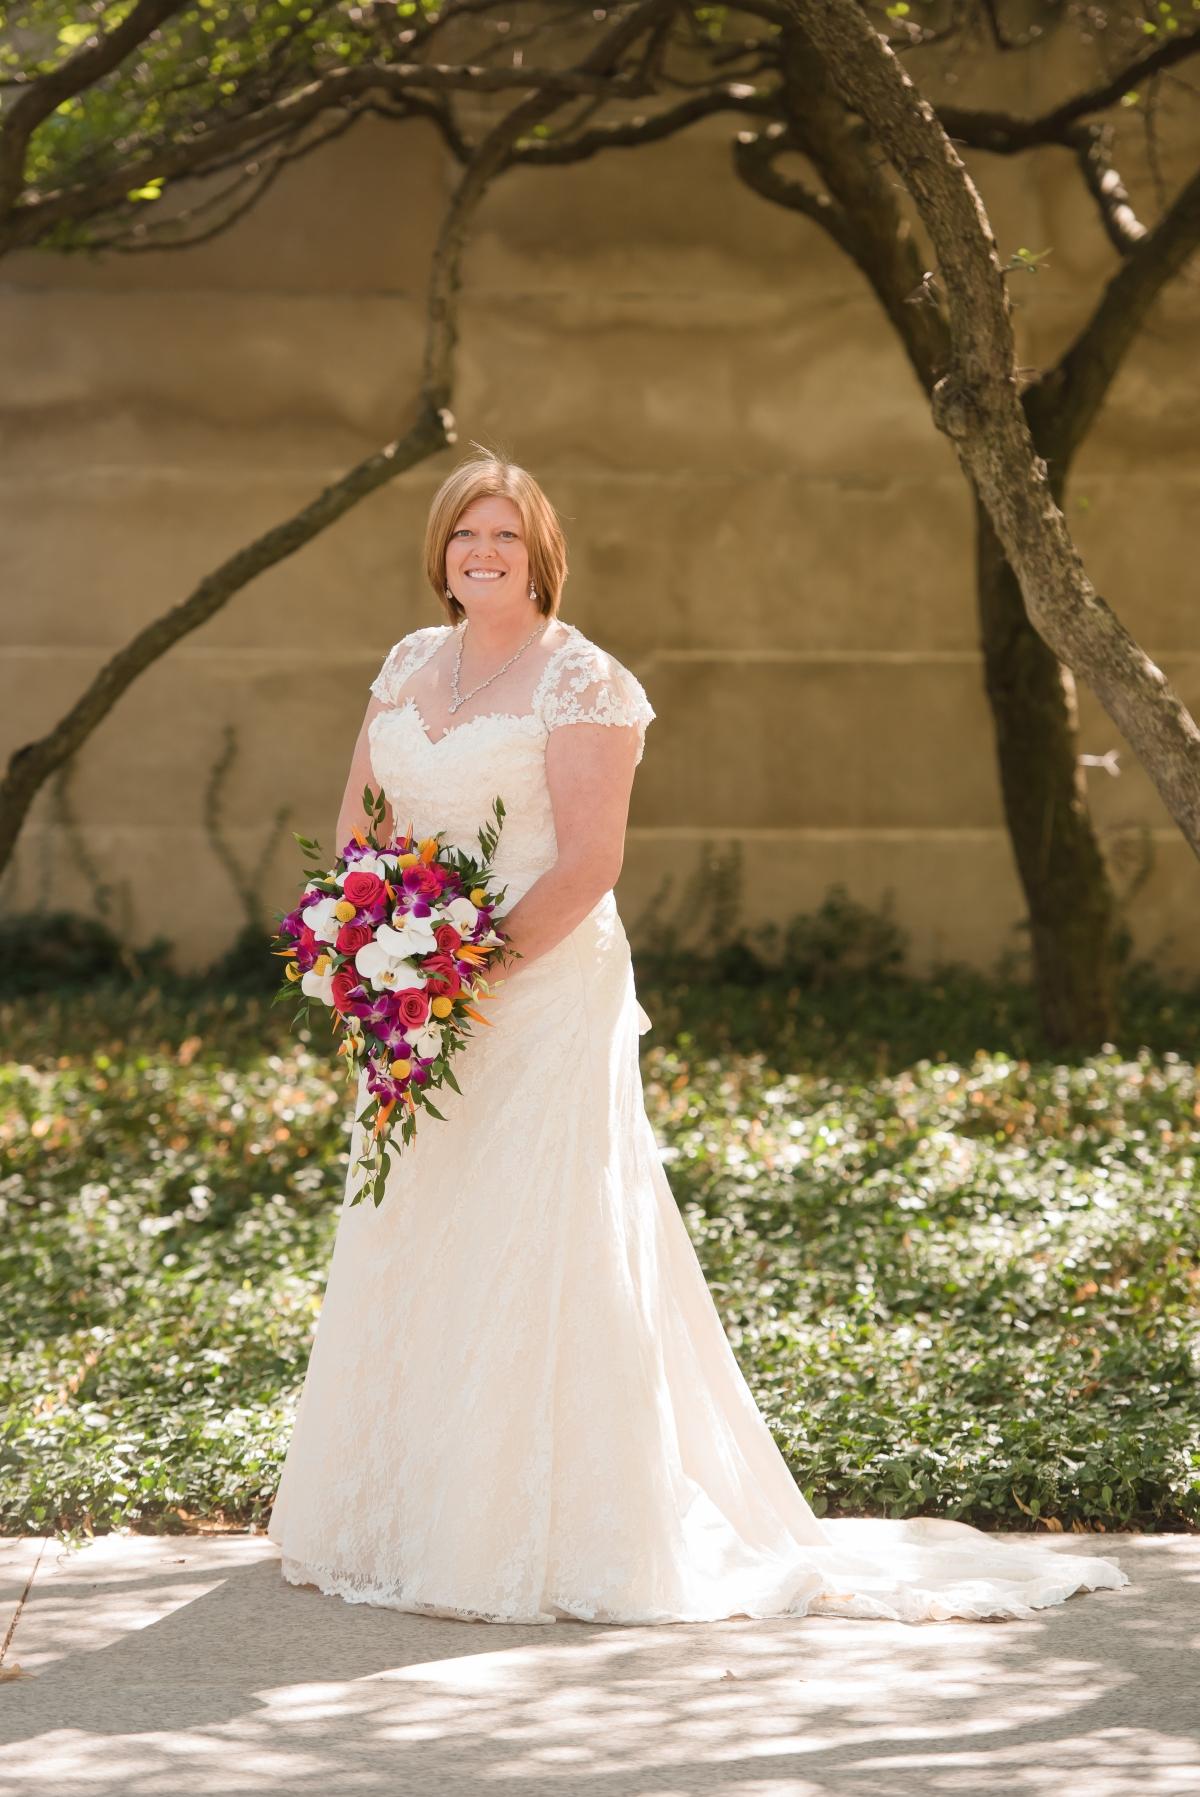 9 19 20 Lori Tiff Wedding 189